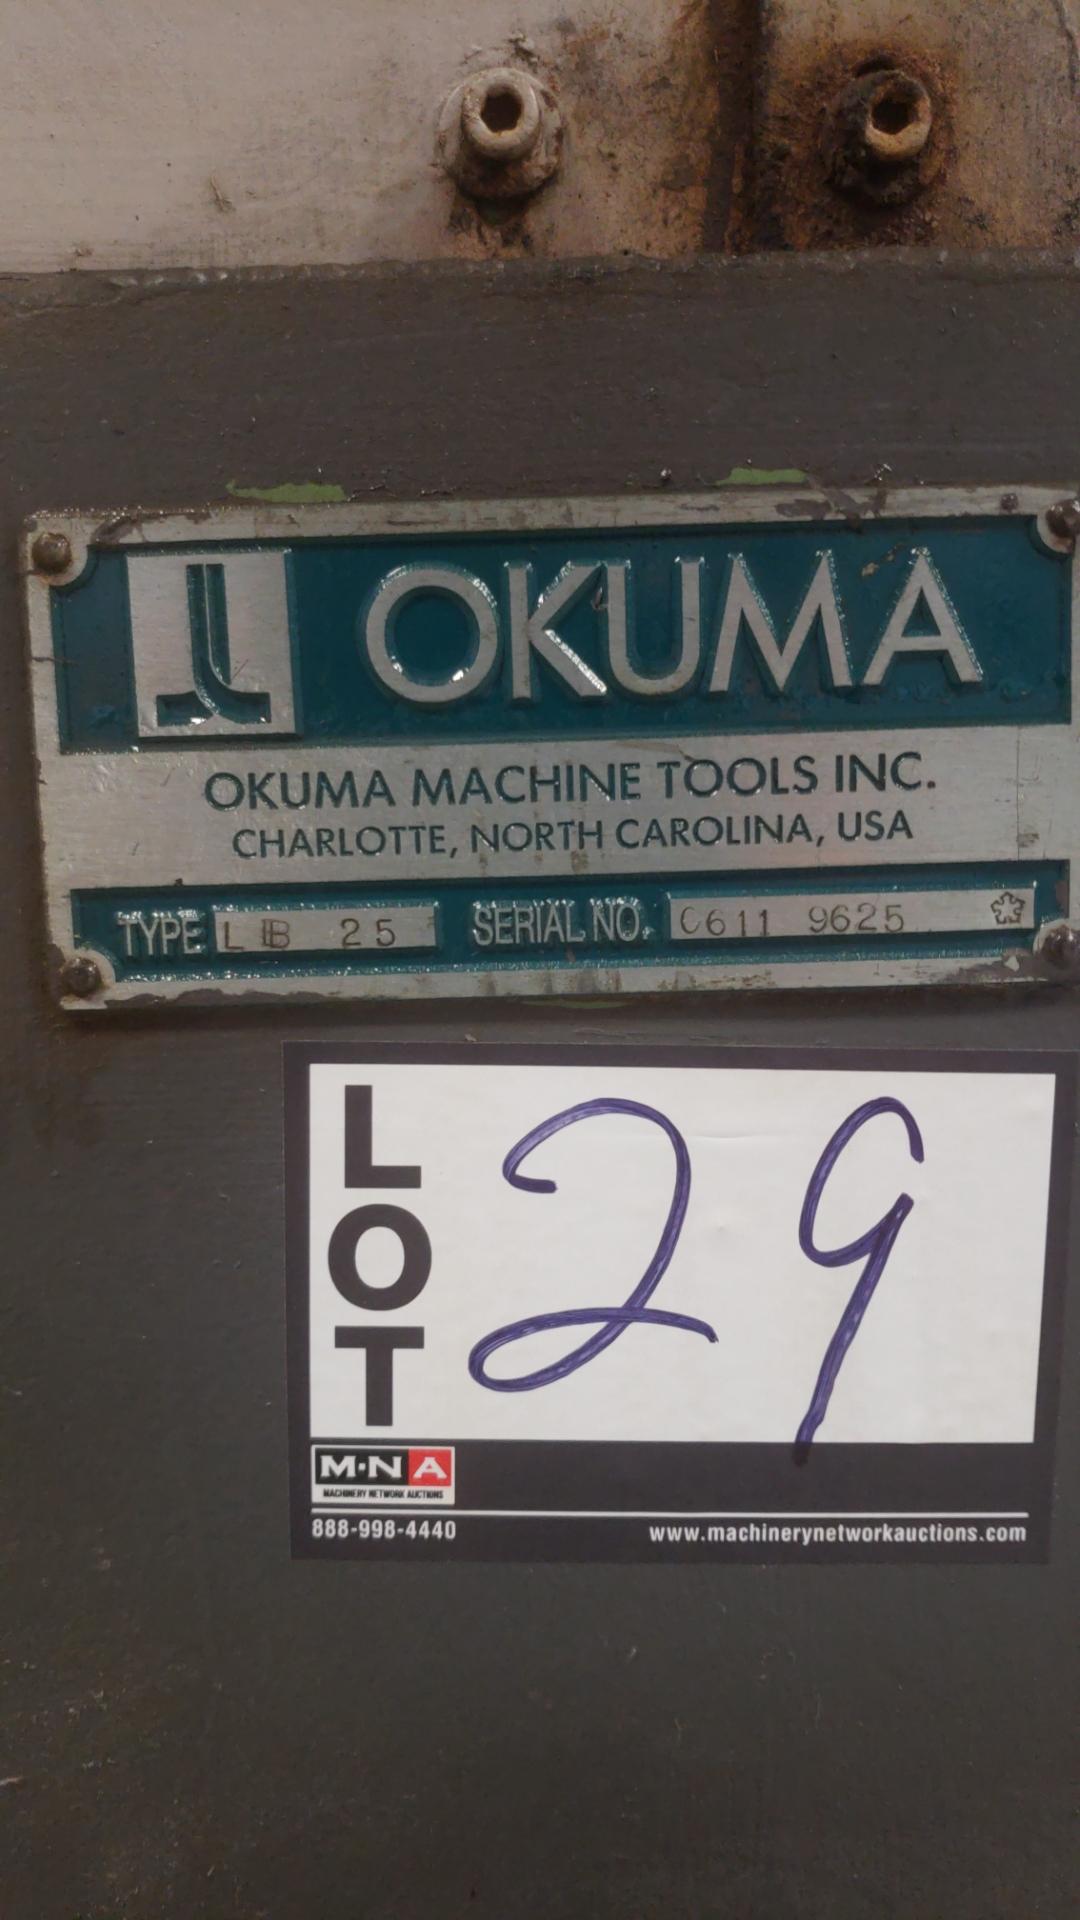 "Okuma LB 25 2 Axis CNC lathe, 5020 control, chip conveyor, 10"" chuck SN: 06119625 - Image 7 of 7"